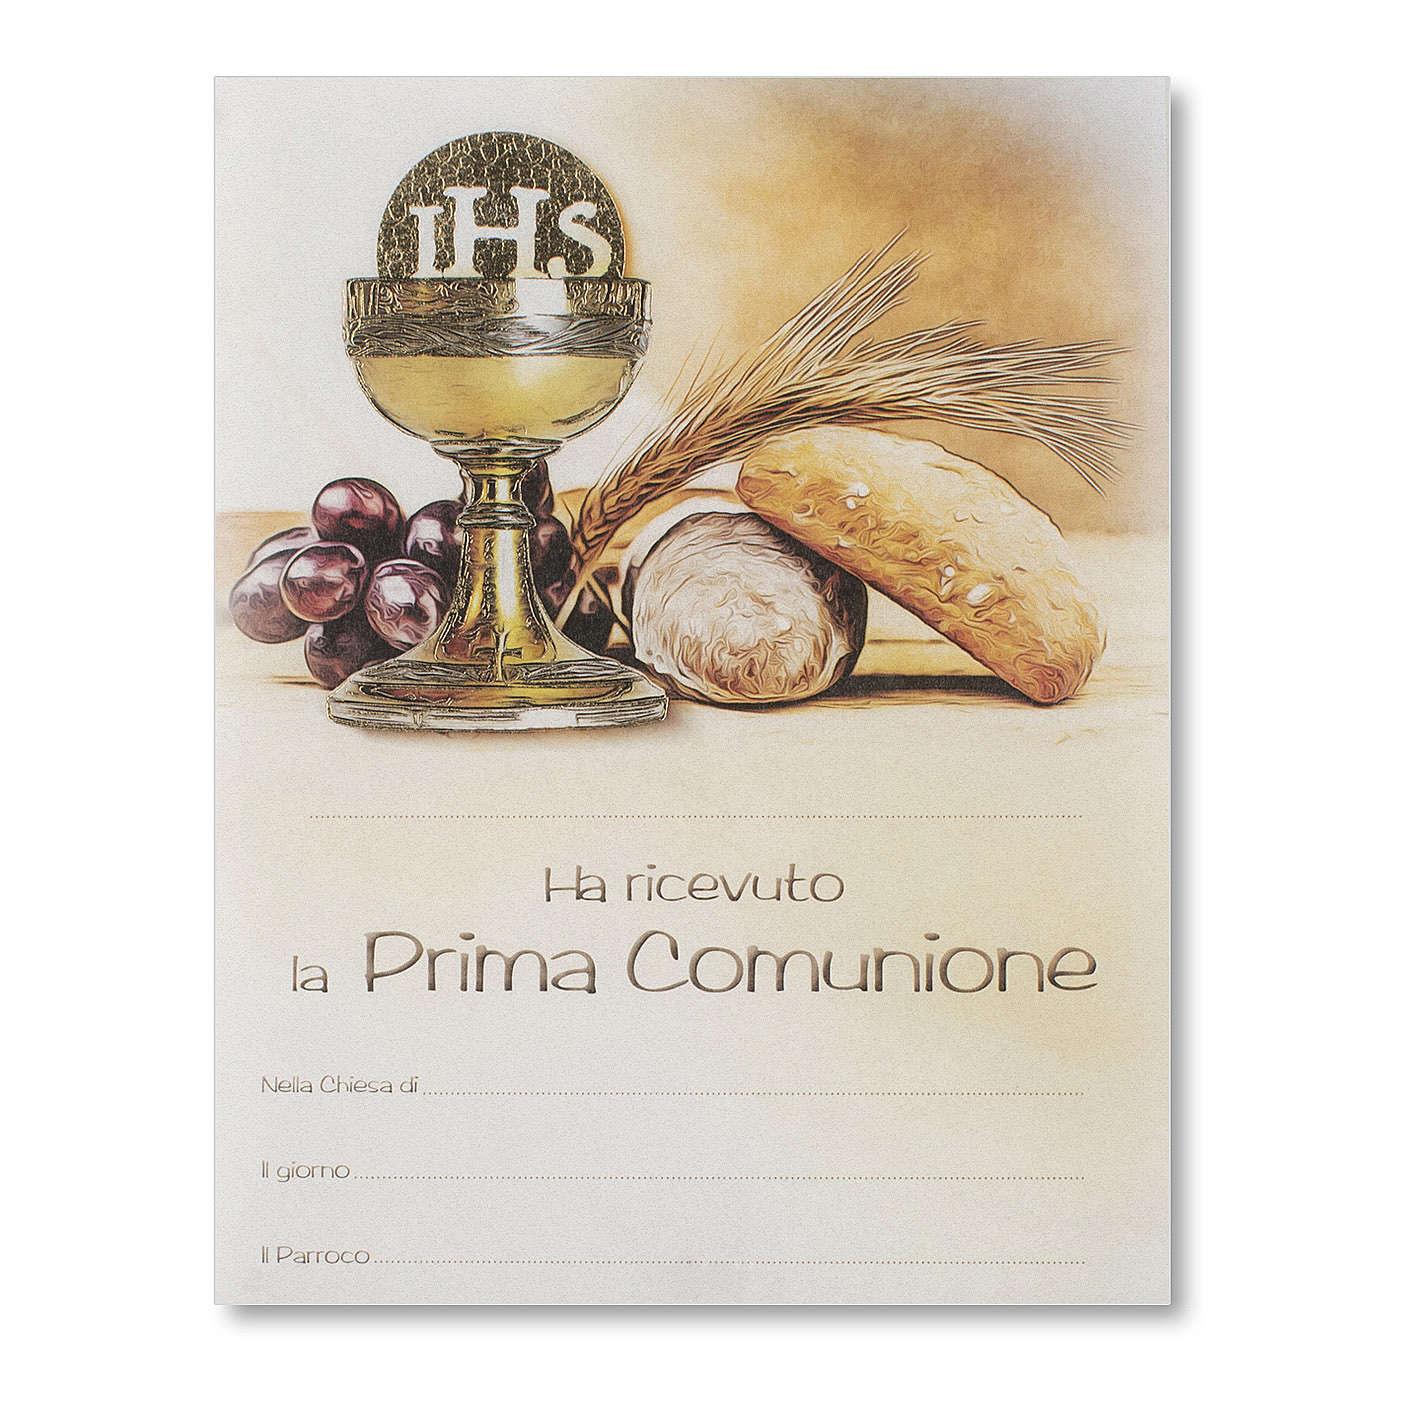 Pergamino Primera Comunión Símbolos Eucarísticos pan, espiga uva y cáliz 3